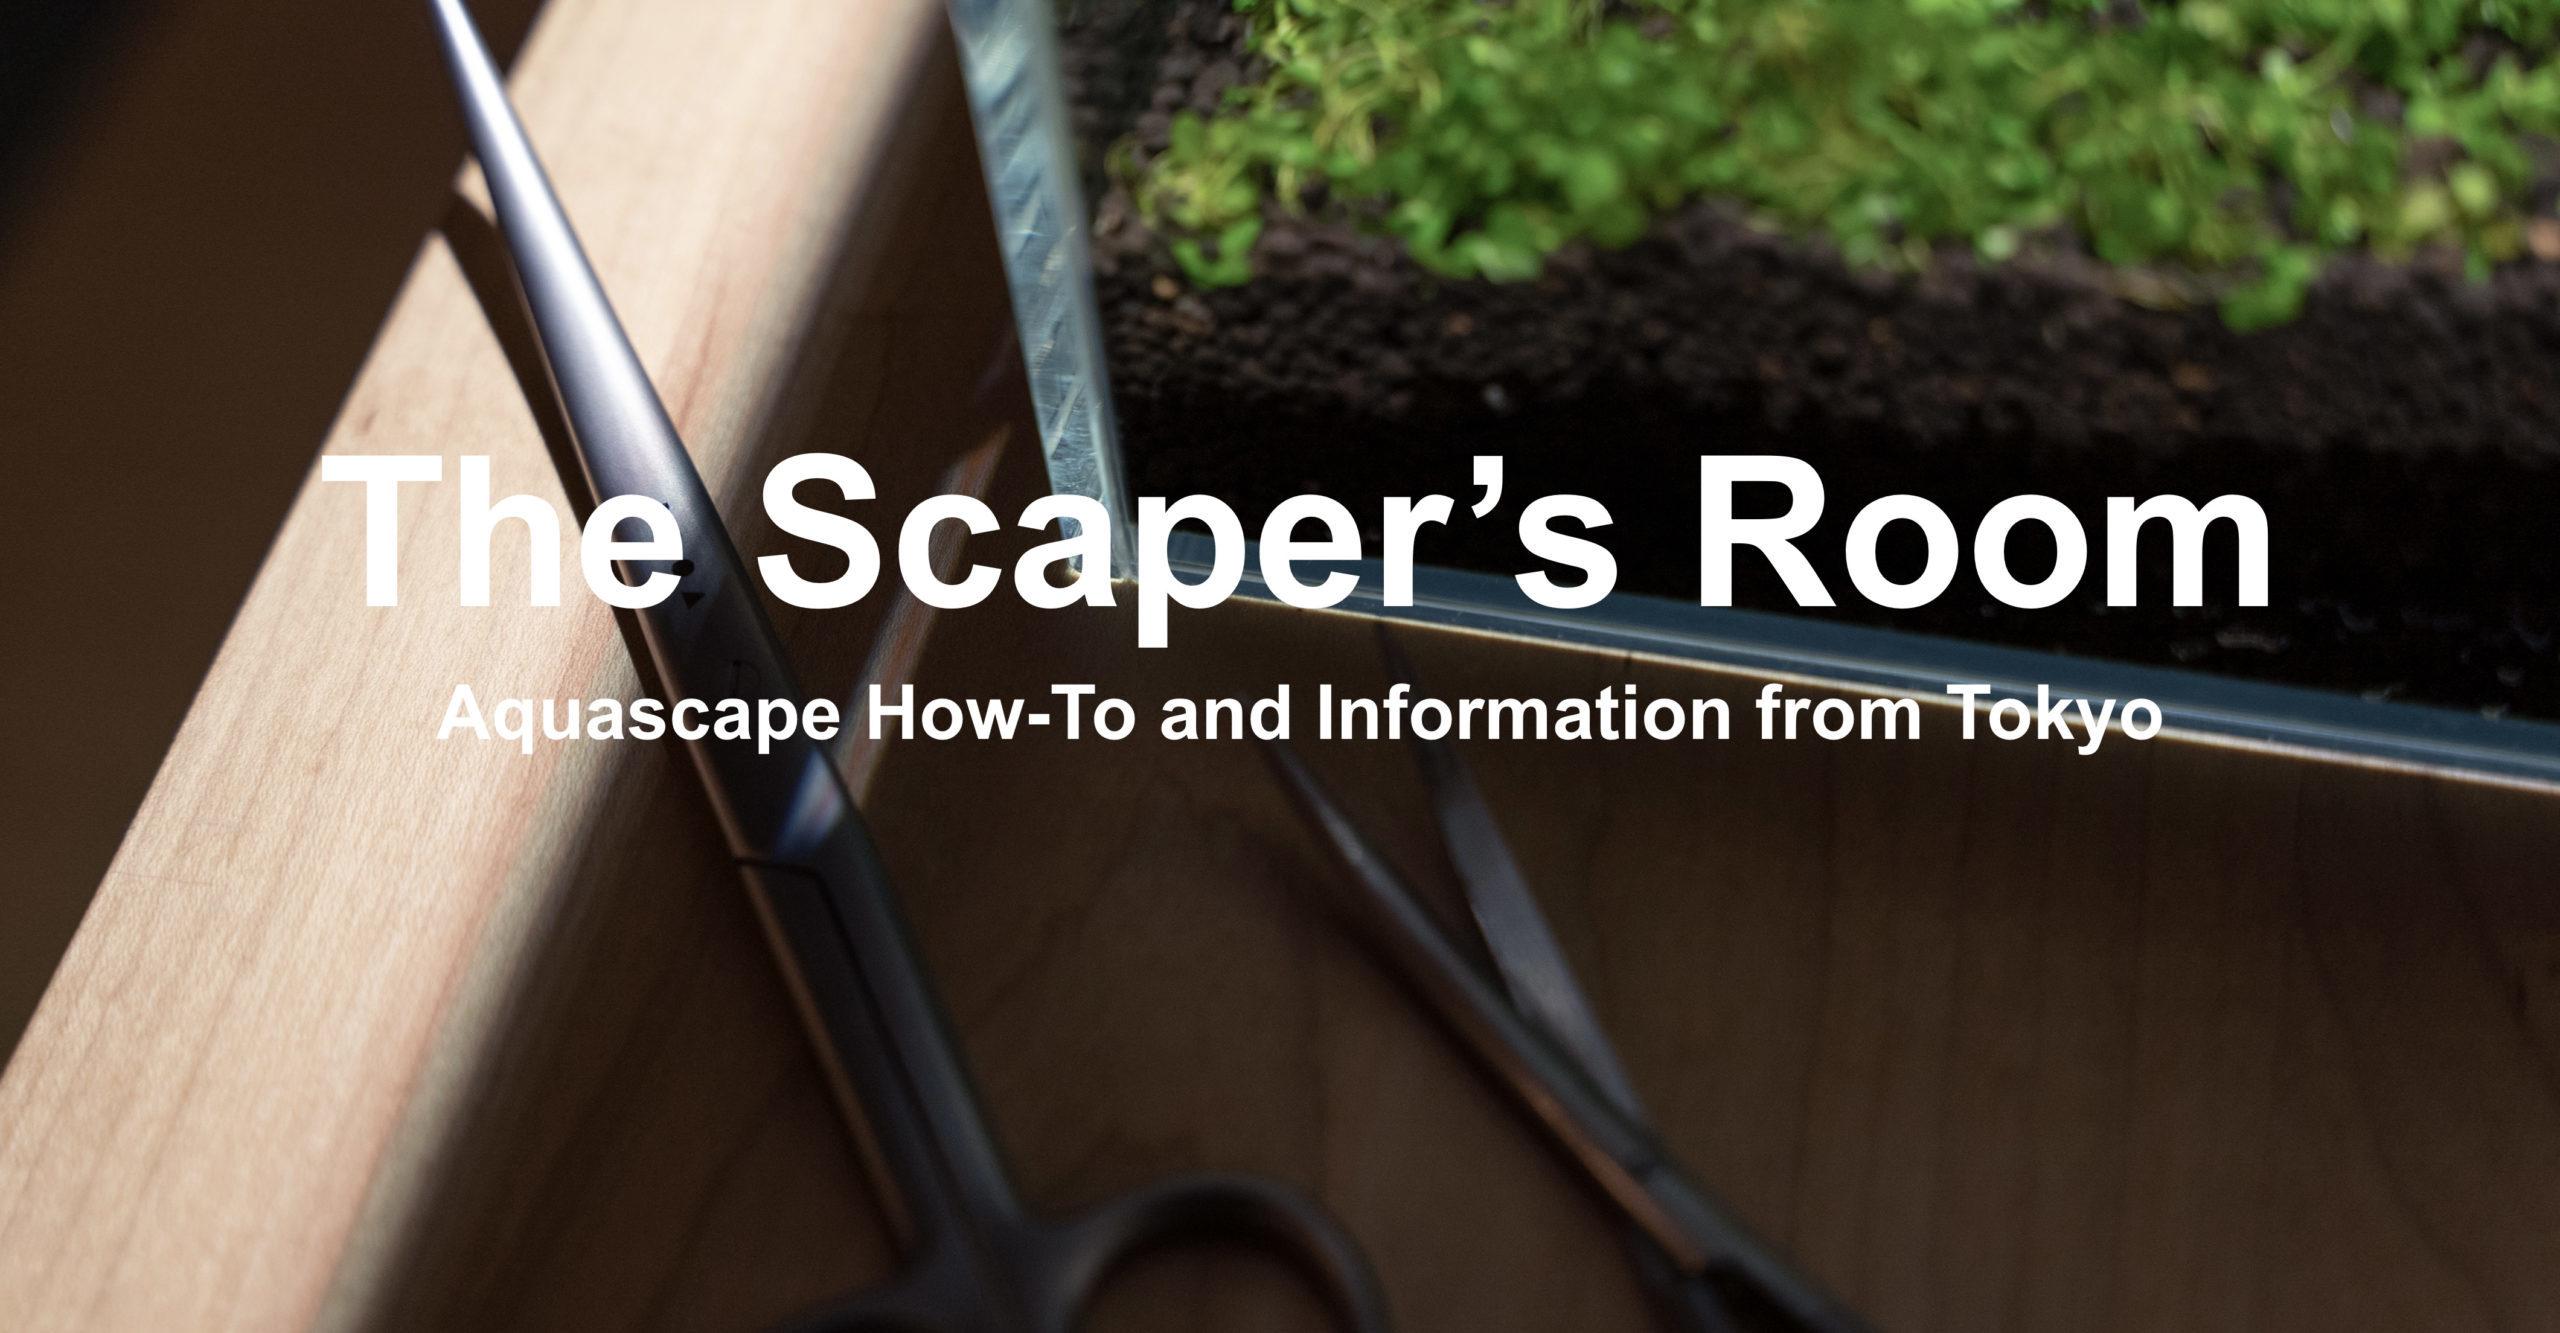 The Scaper's Room